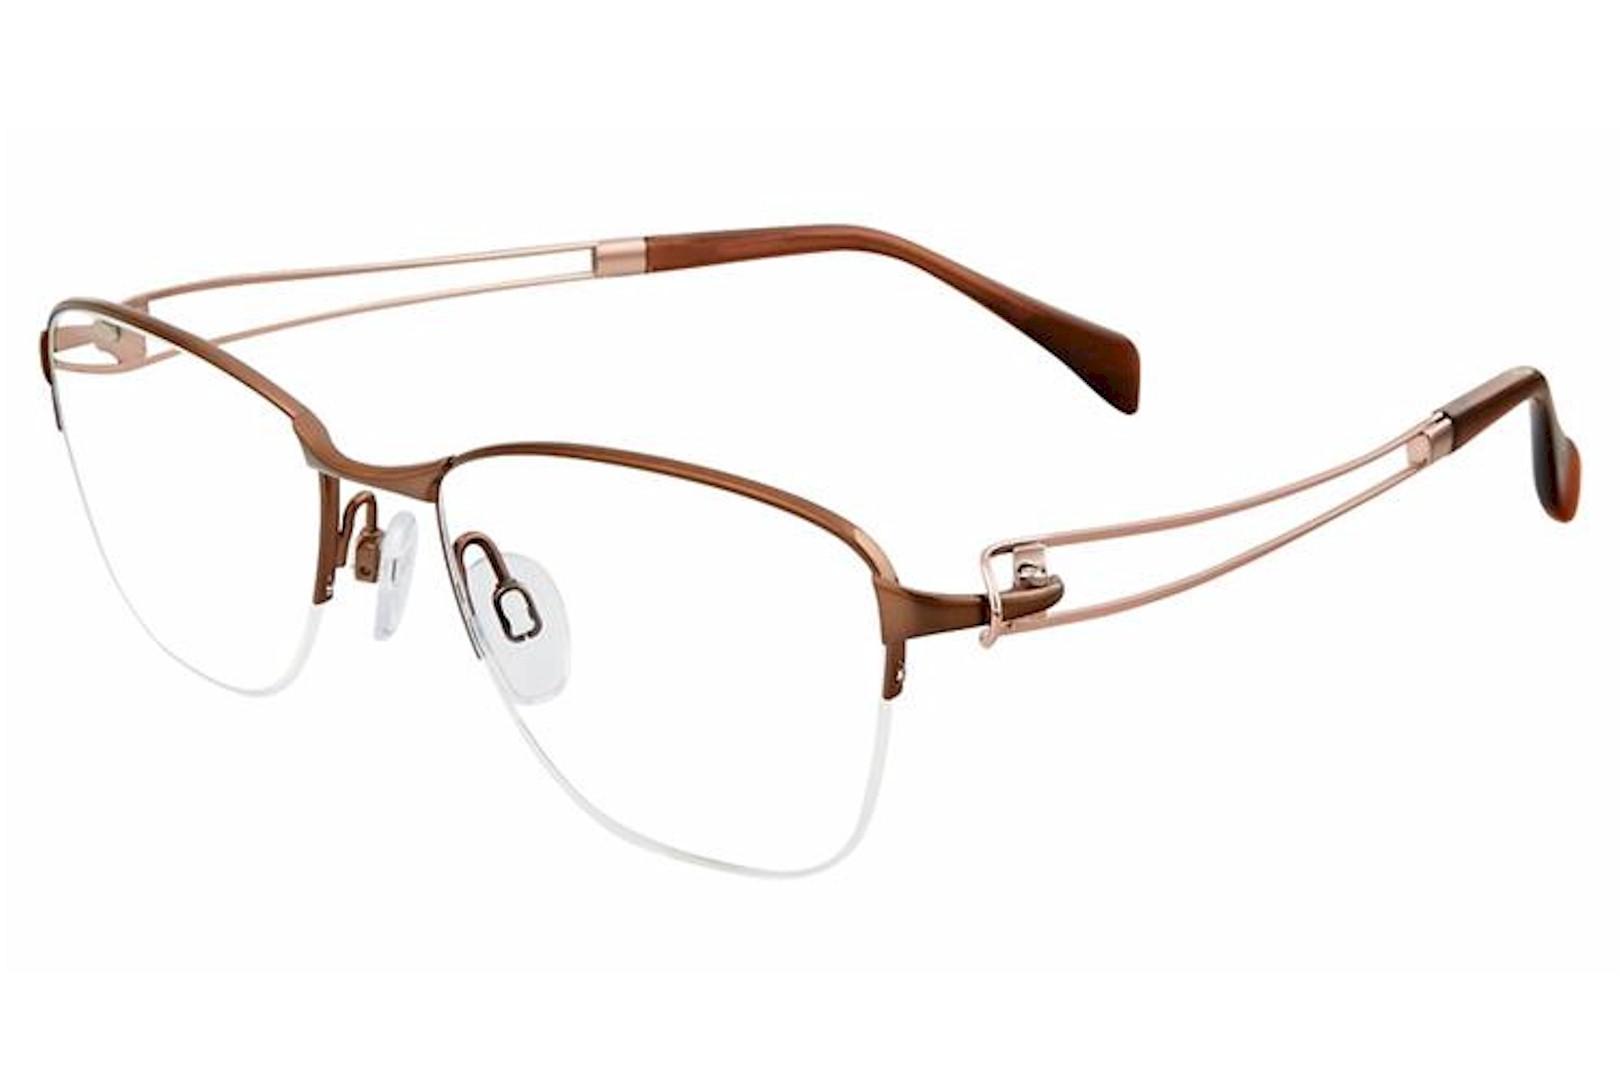 Line Art Xl 2063 Eyeglasses : Charmant line art women s eyeglasses xl half